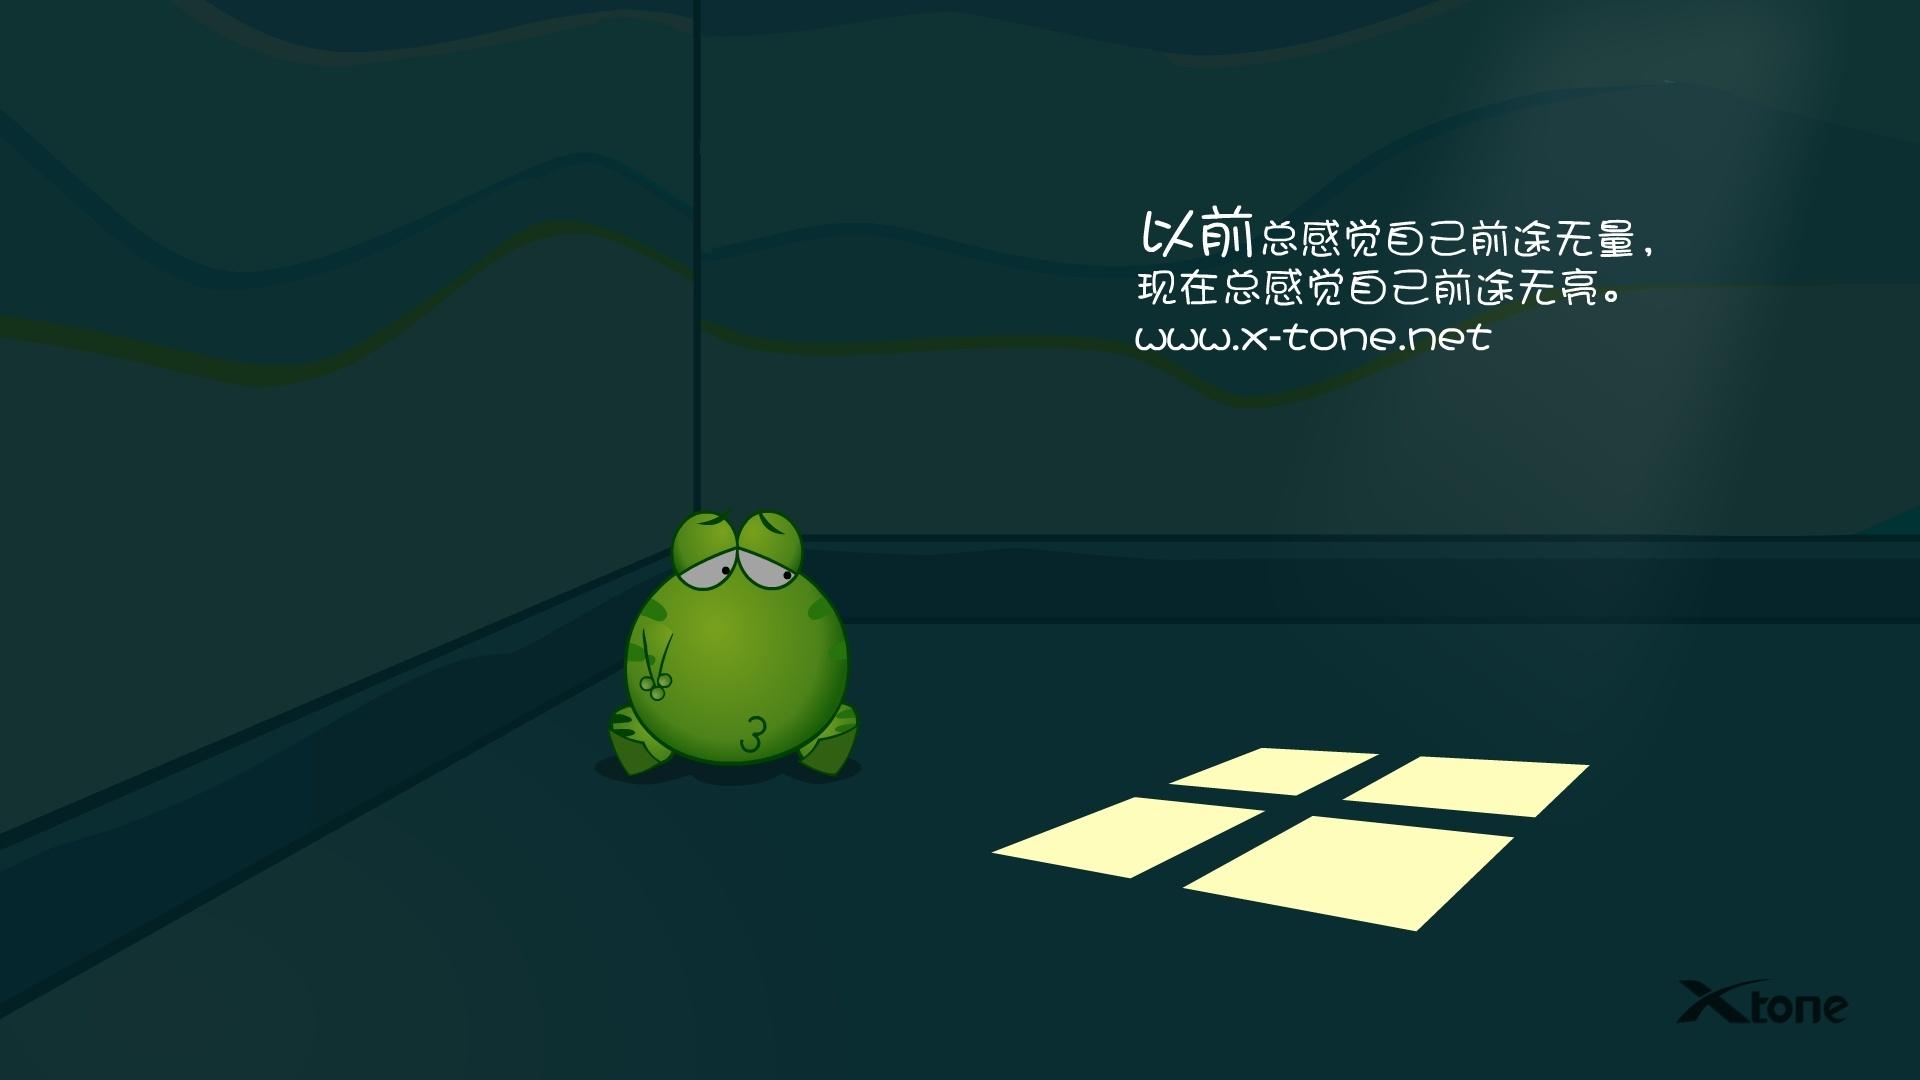 XTone翔通动漫集团-绿豆蛙精美壁纸(一) 插画 